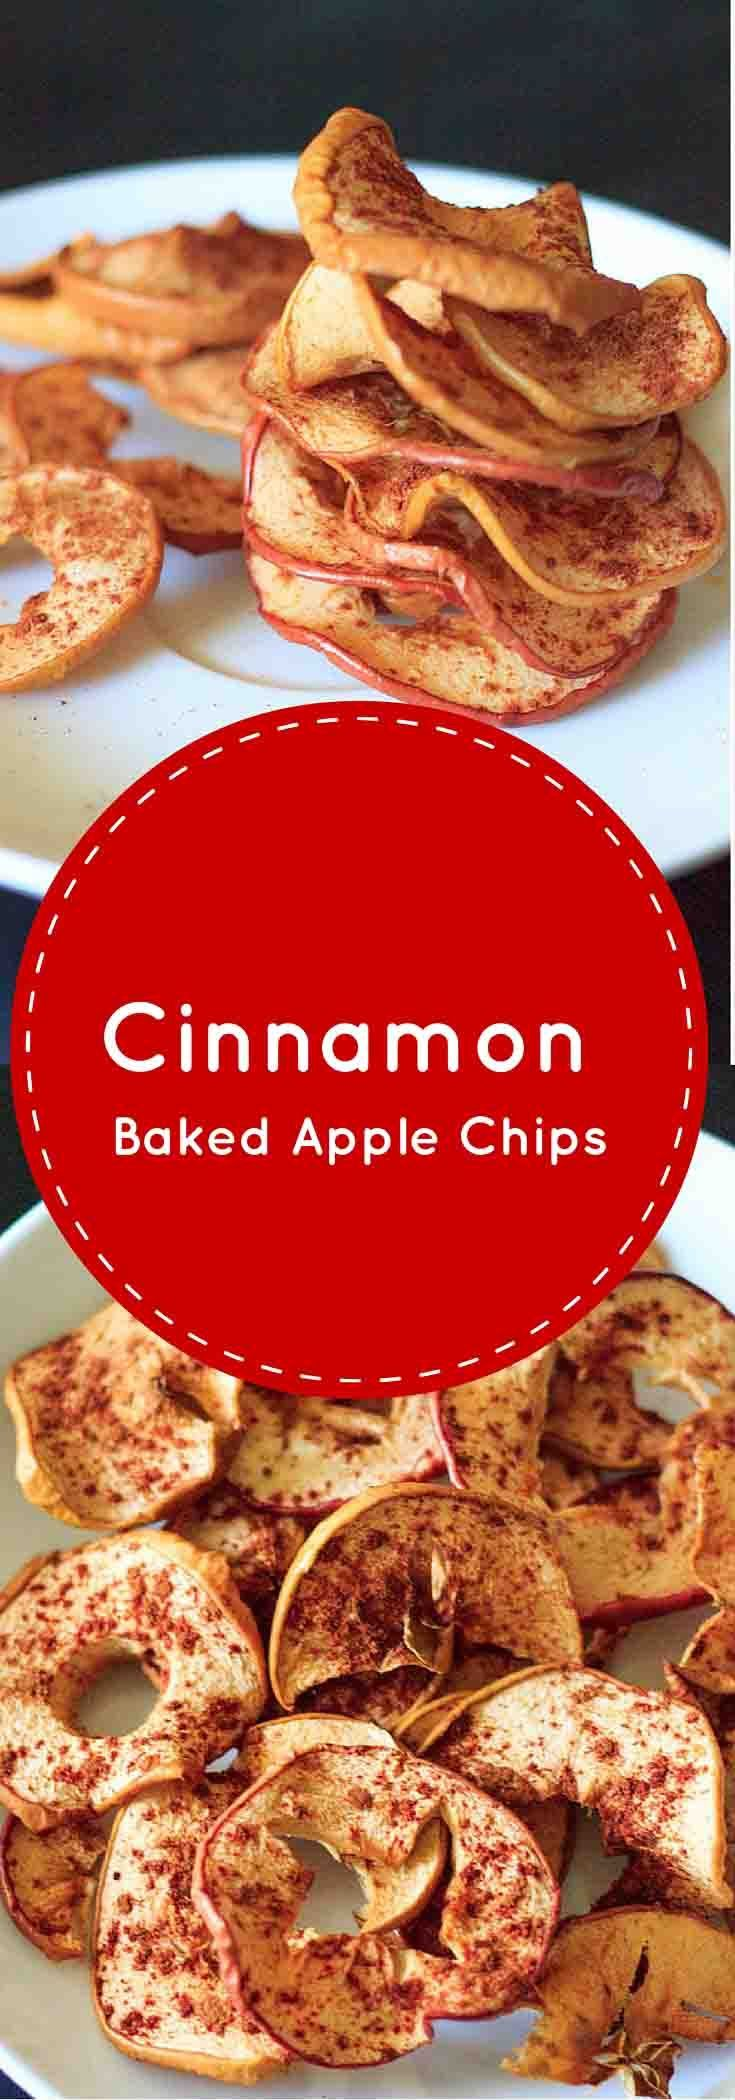 Cinnamon Apple Chips - healthy, vegan, gluten-free